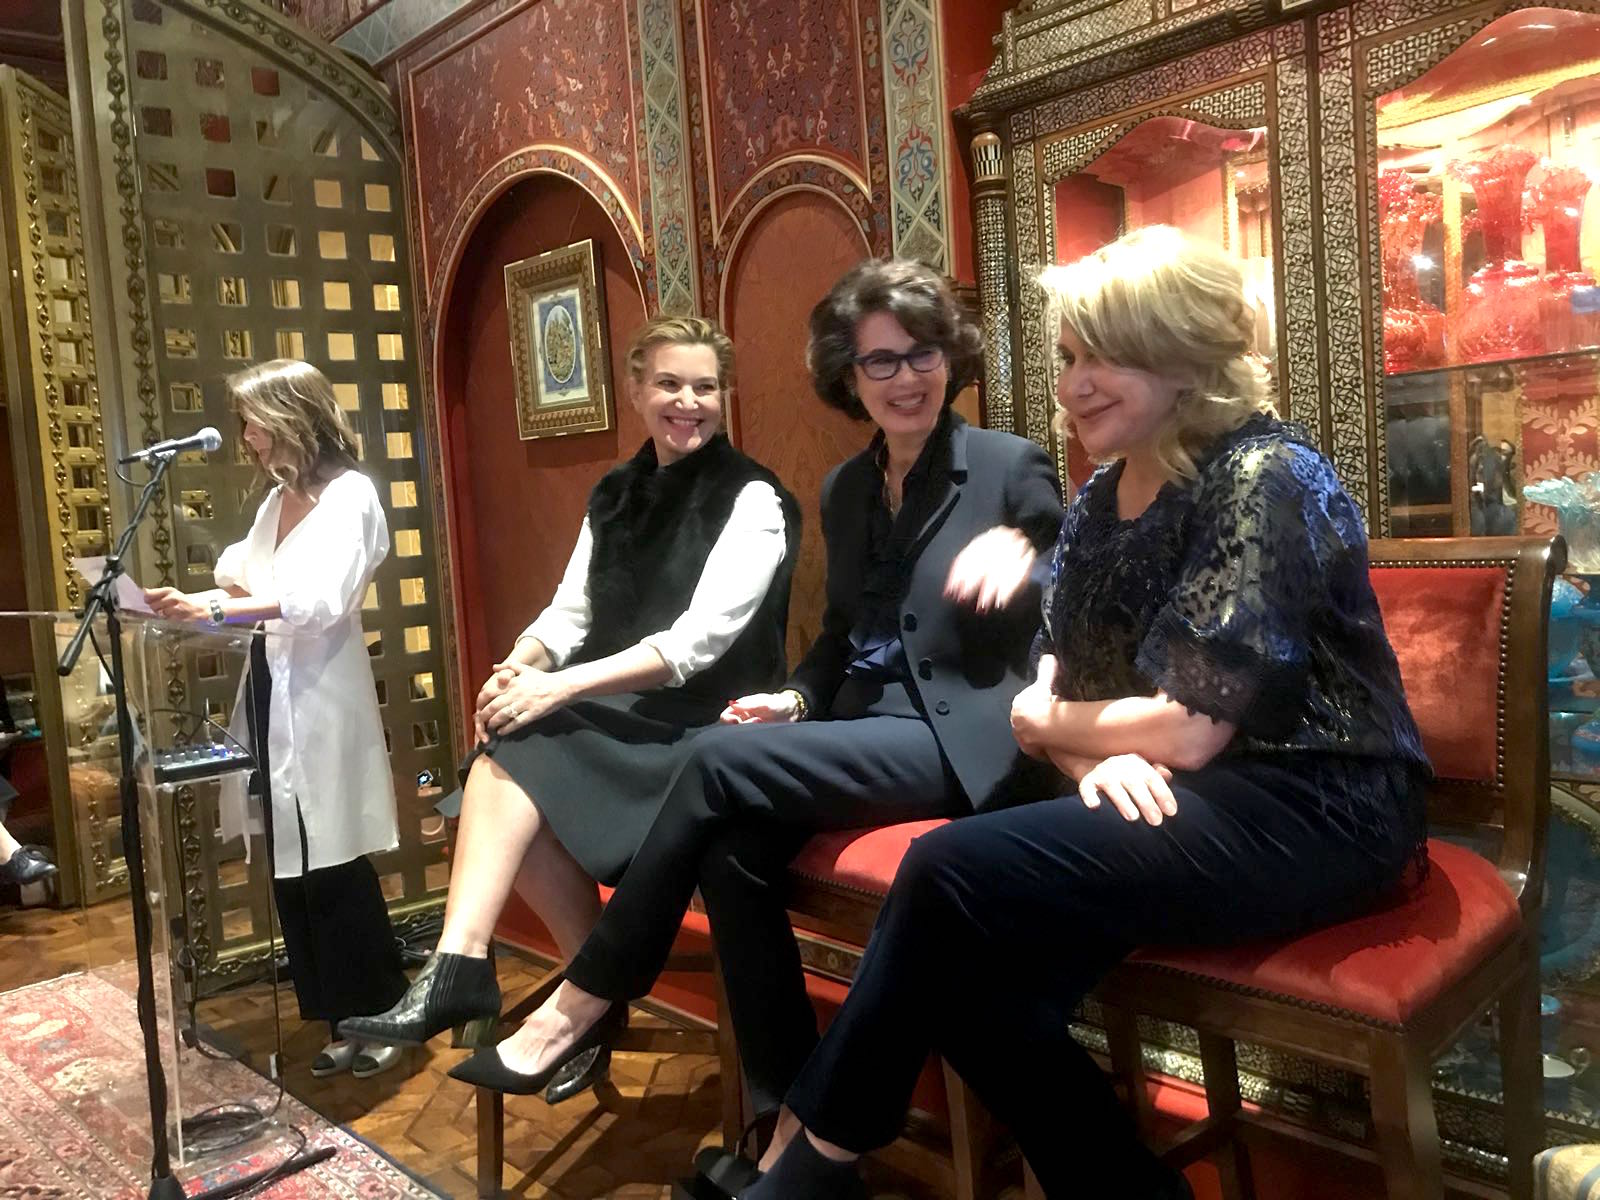 From left, Angella Nazarian, Krista Smith, Dayle Haddon, and Ghada Irani. (Photos courtesy of Renee Huesca)